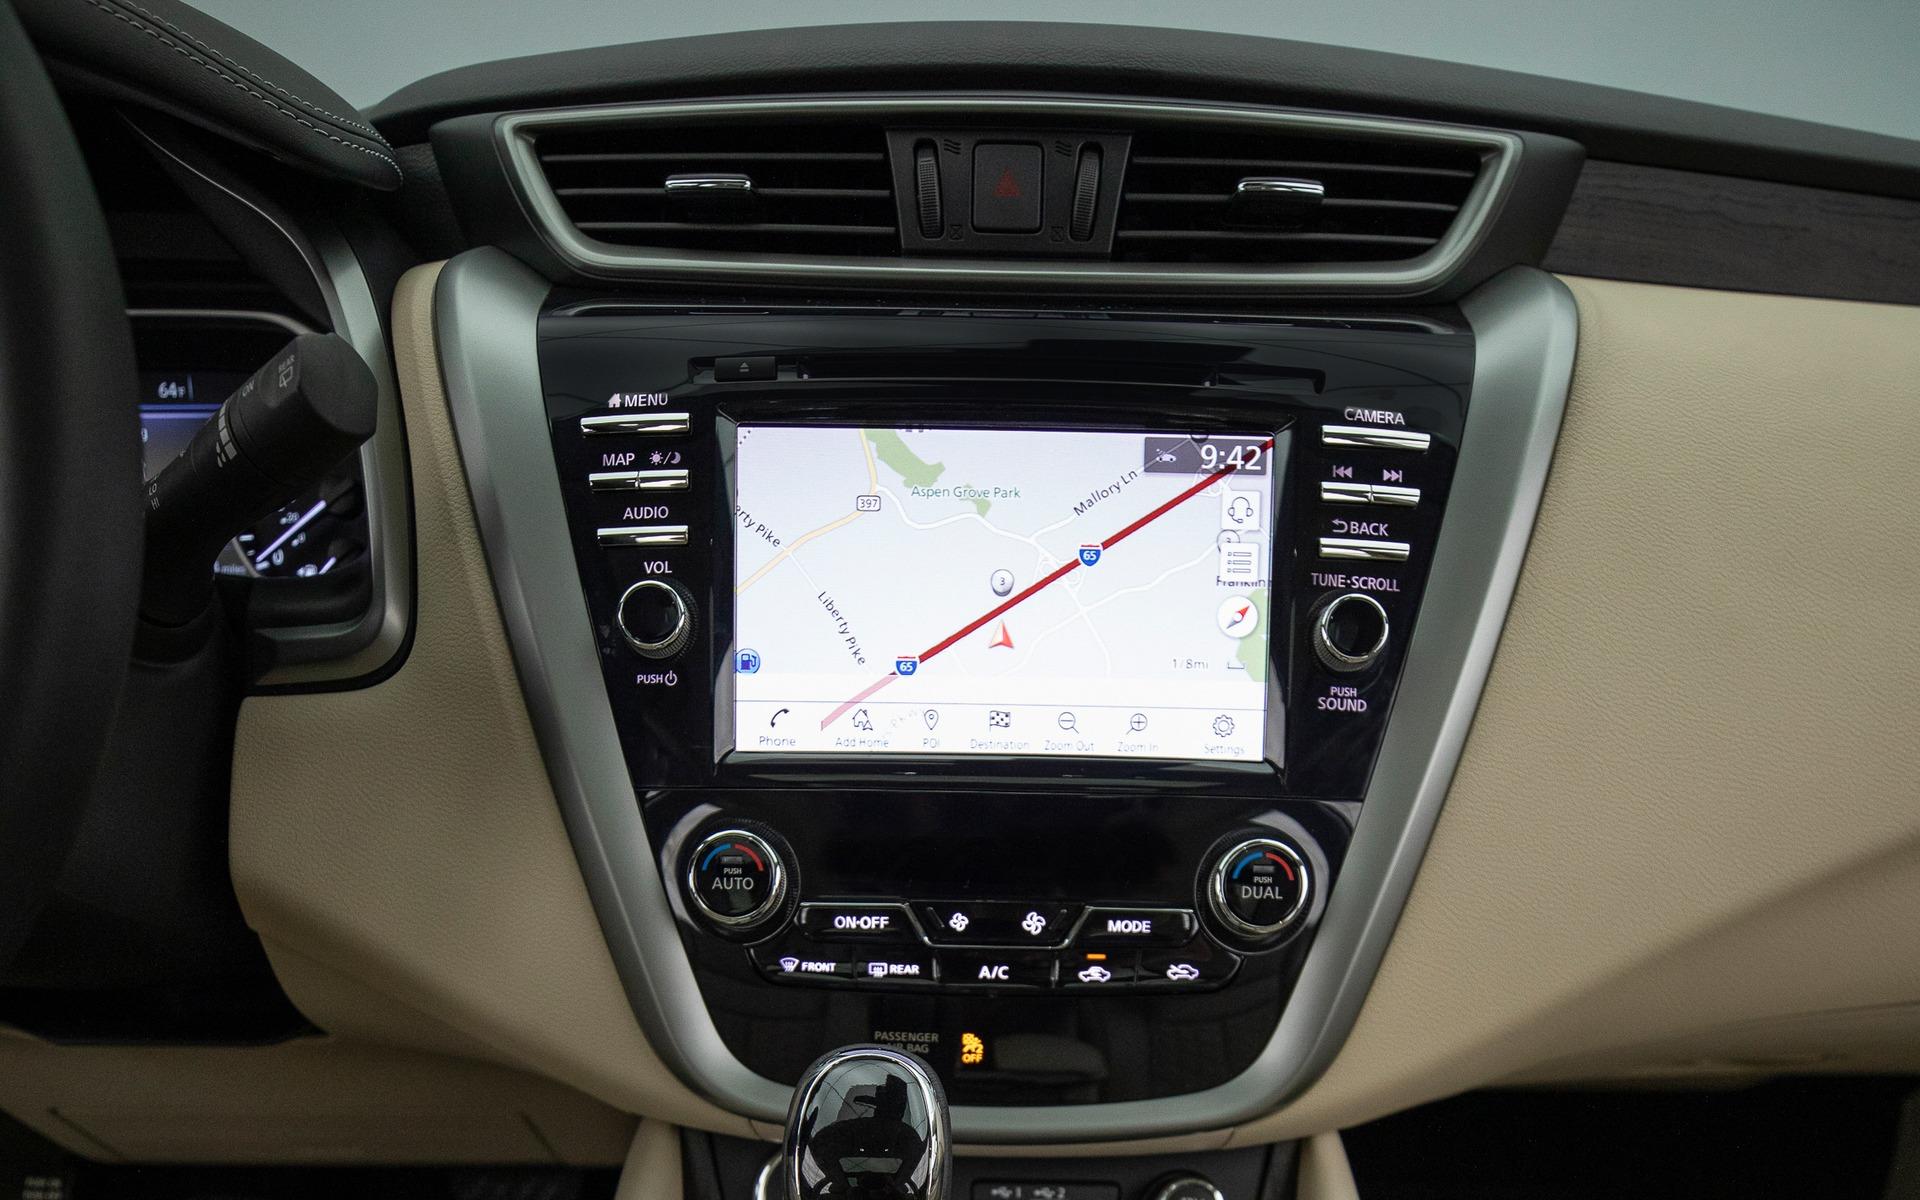 Nissan dévoile le Murano 2019 358015_Niisan_presnte_le_Murano_2019